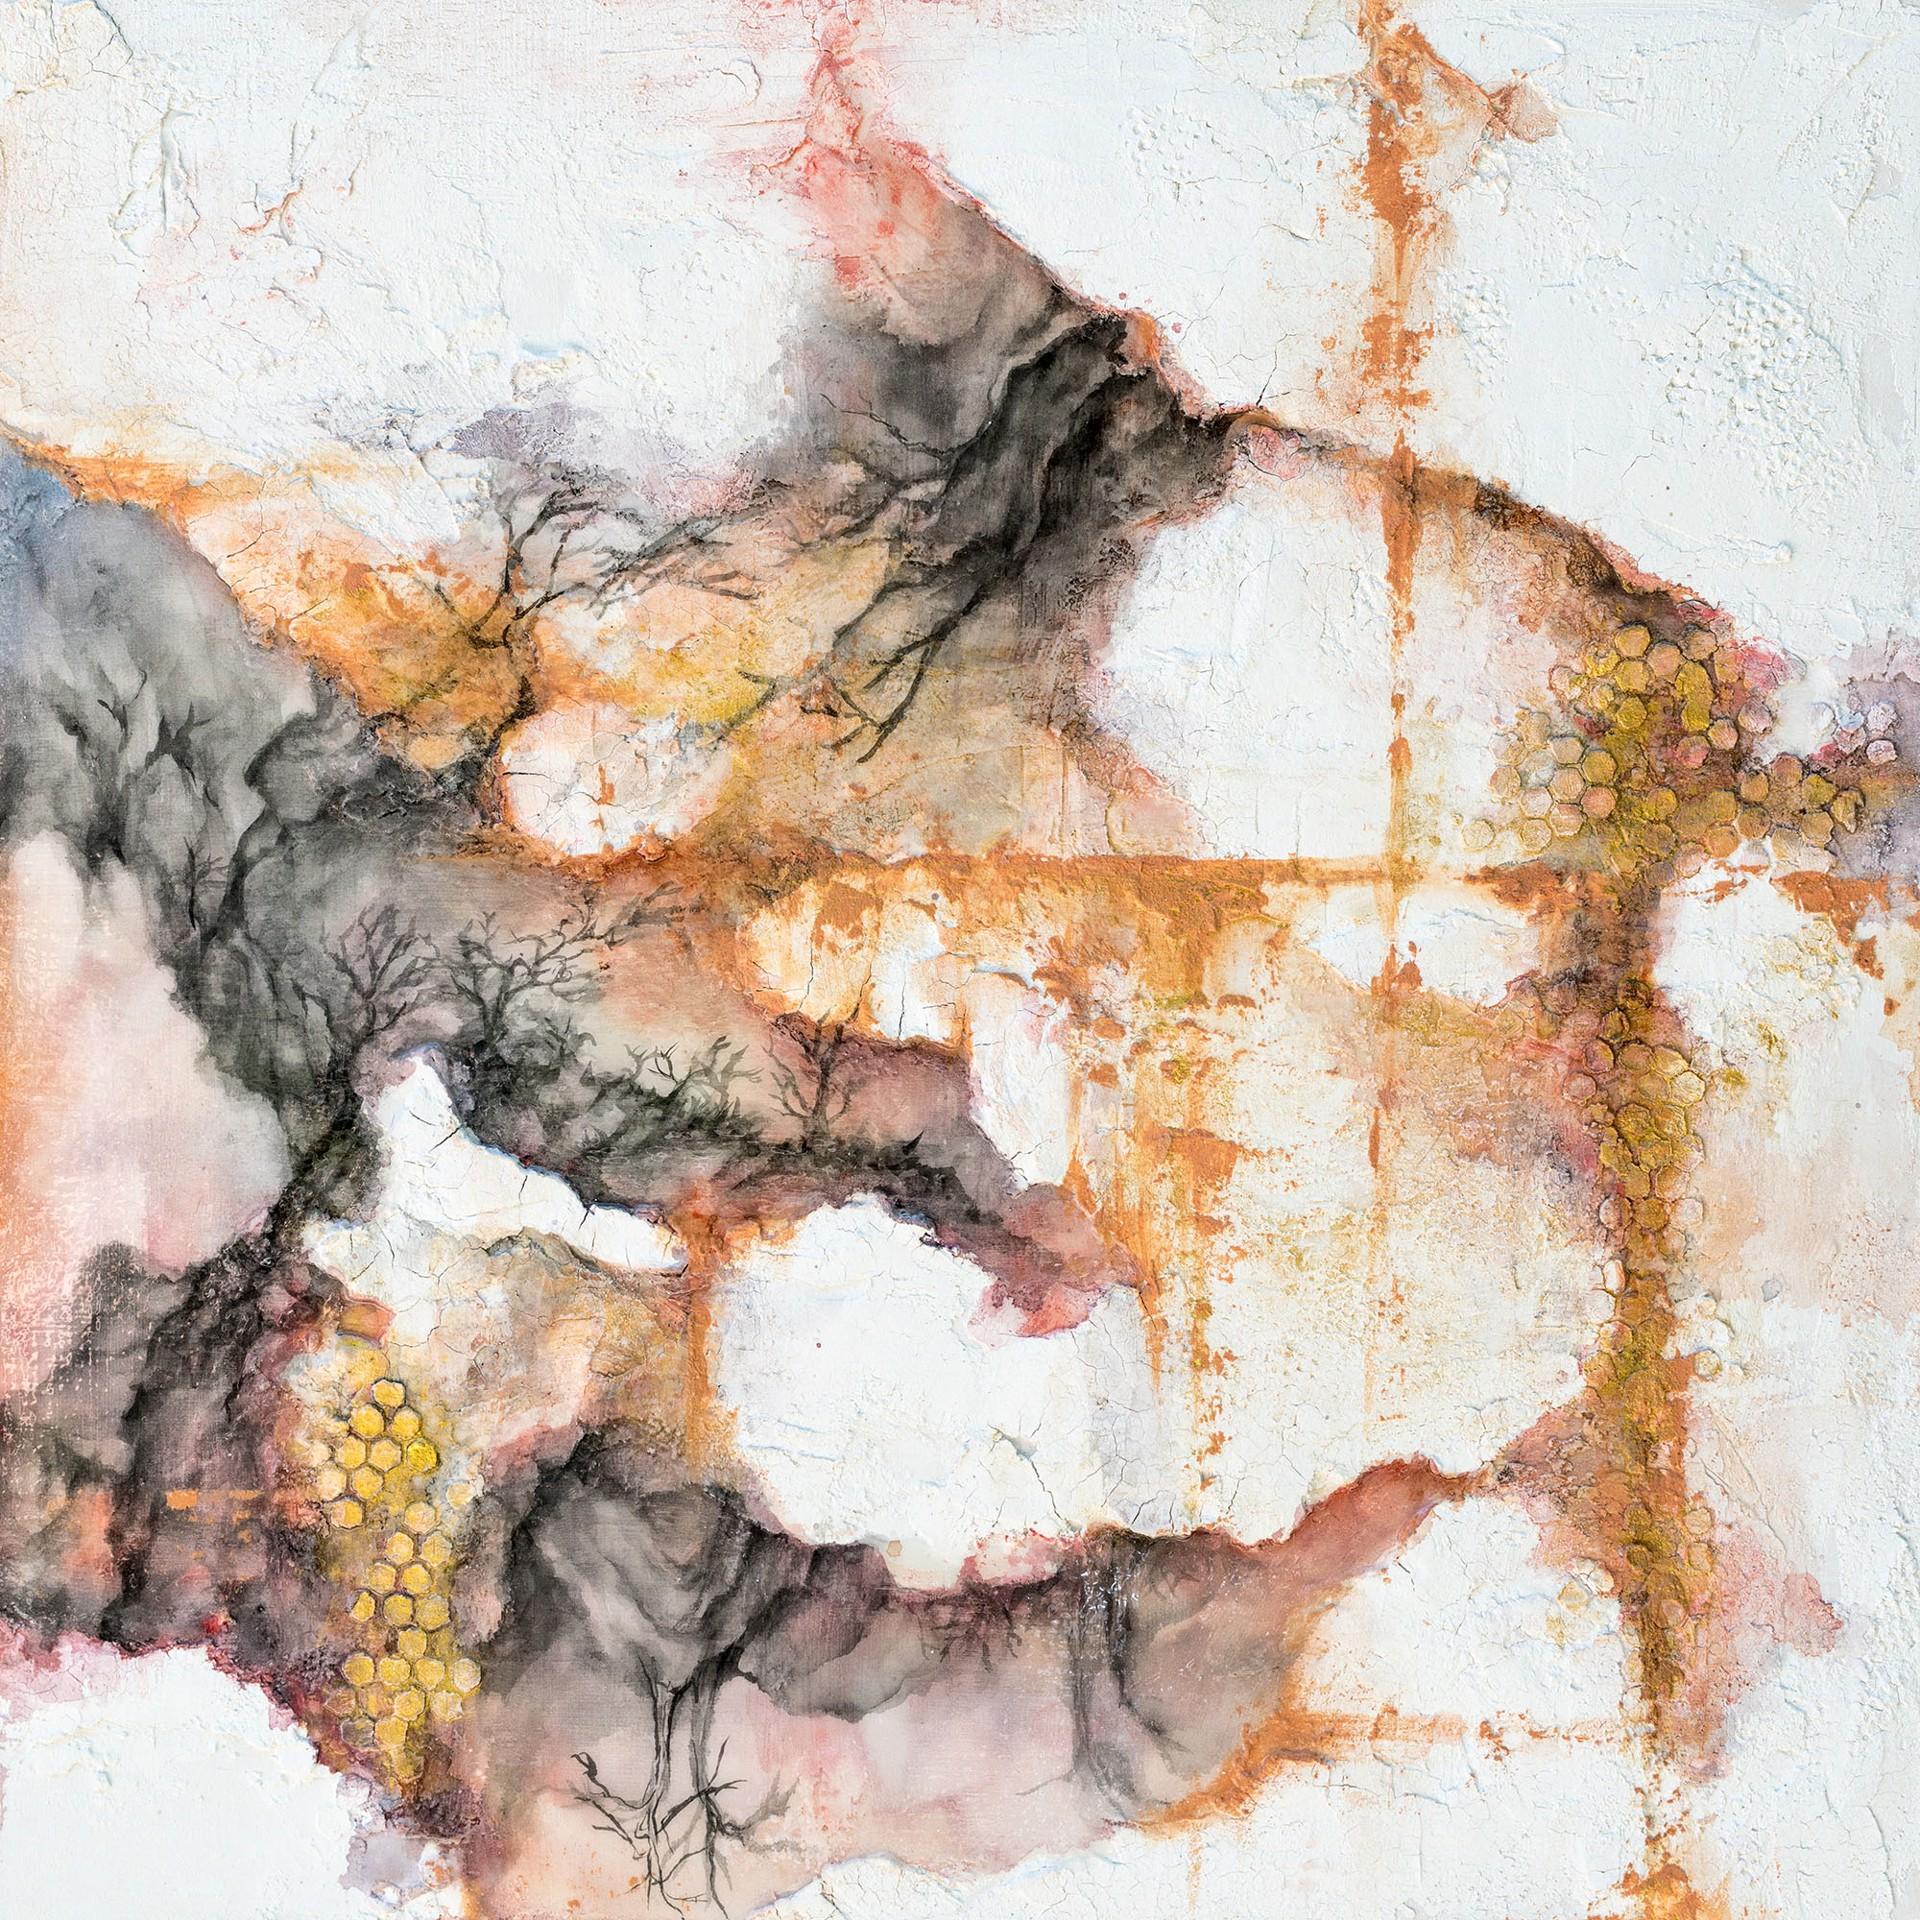 Cultural Erasure II by Cindy Shih